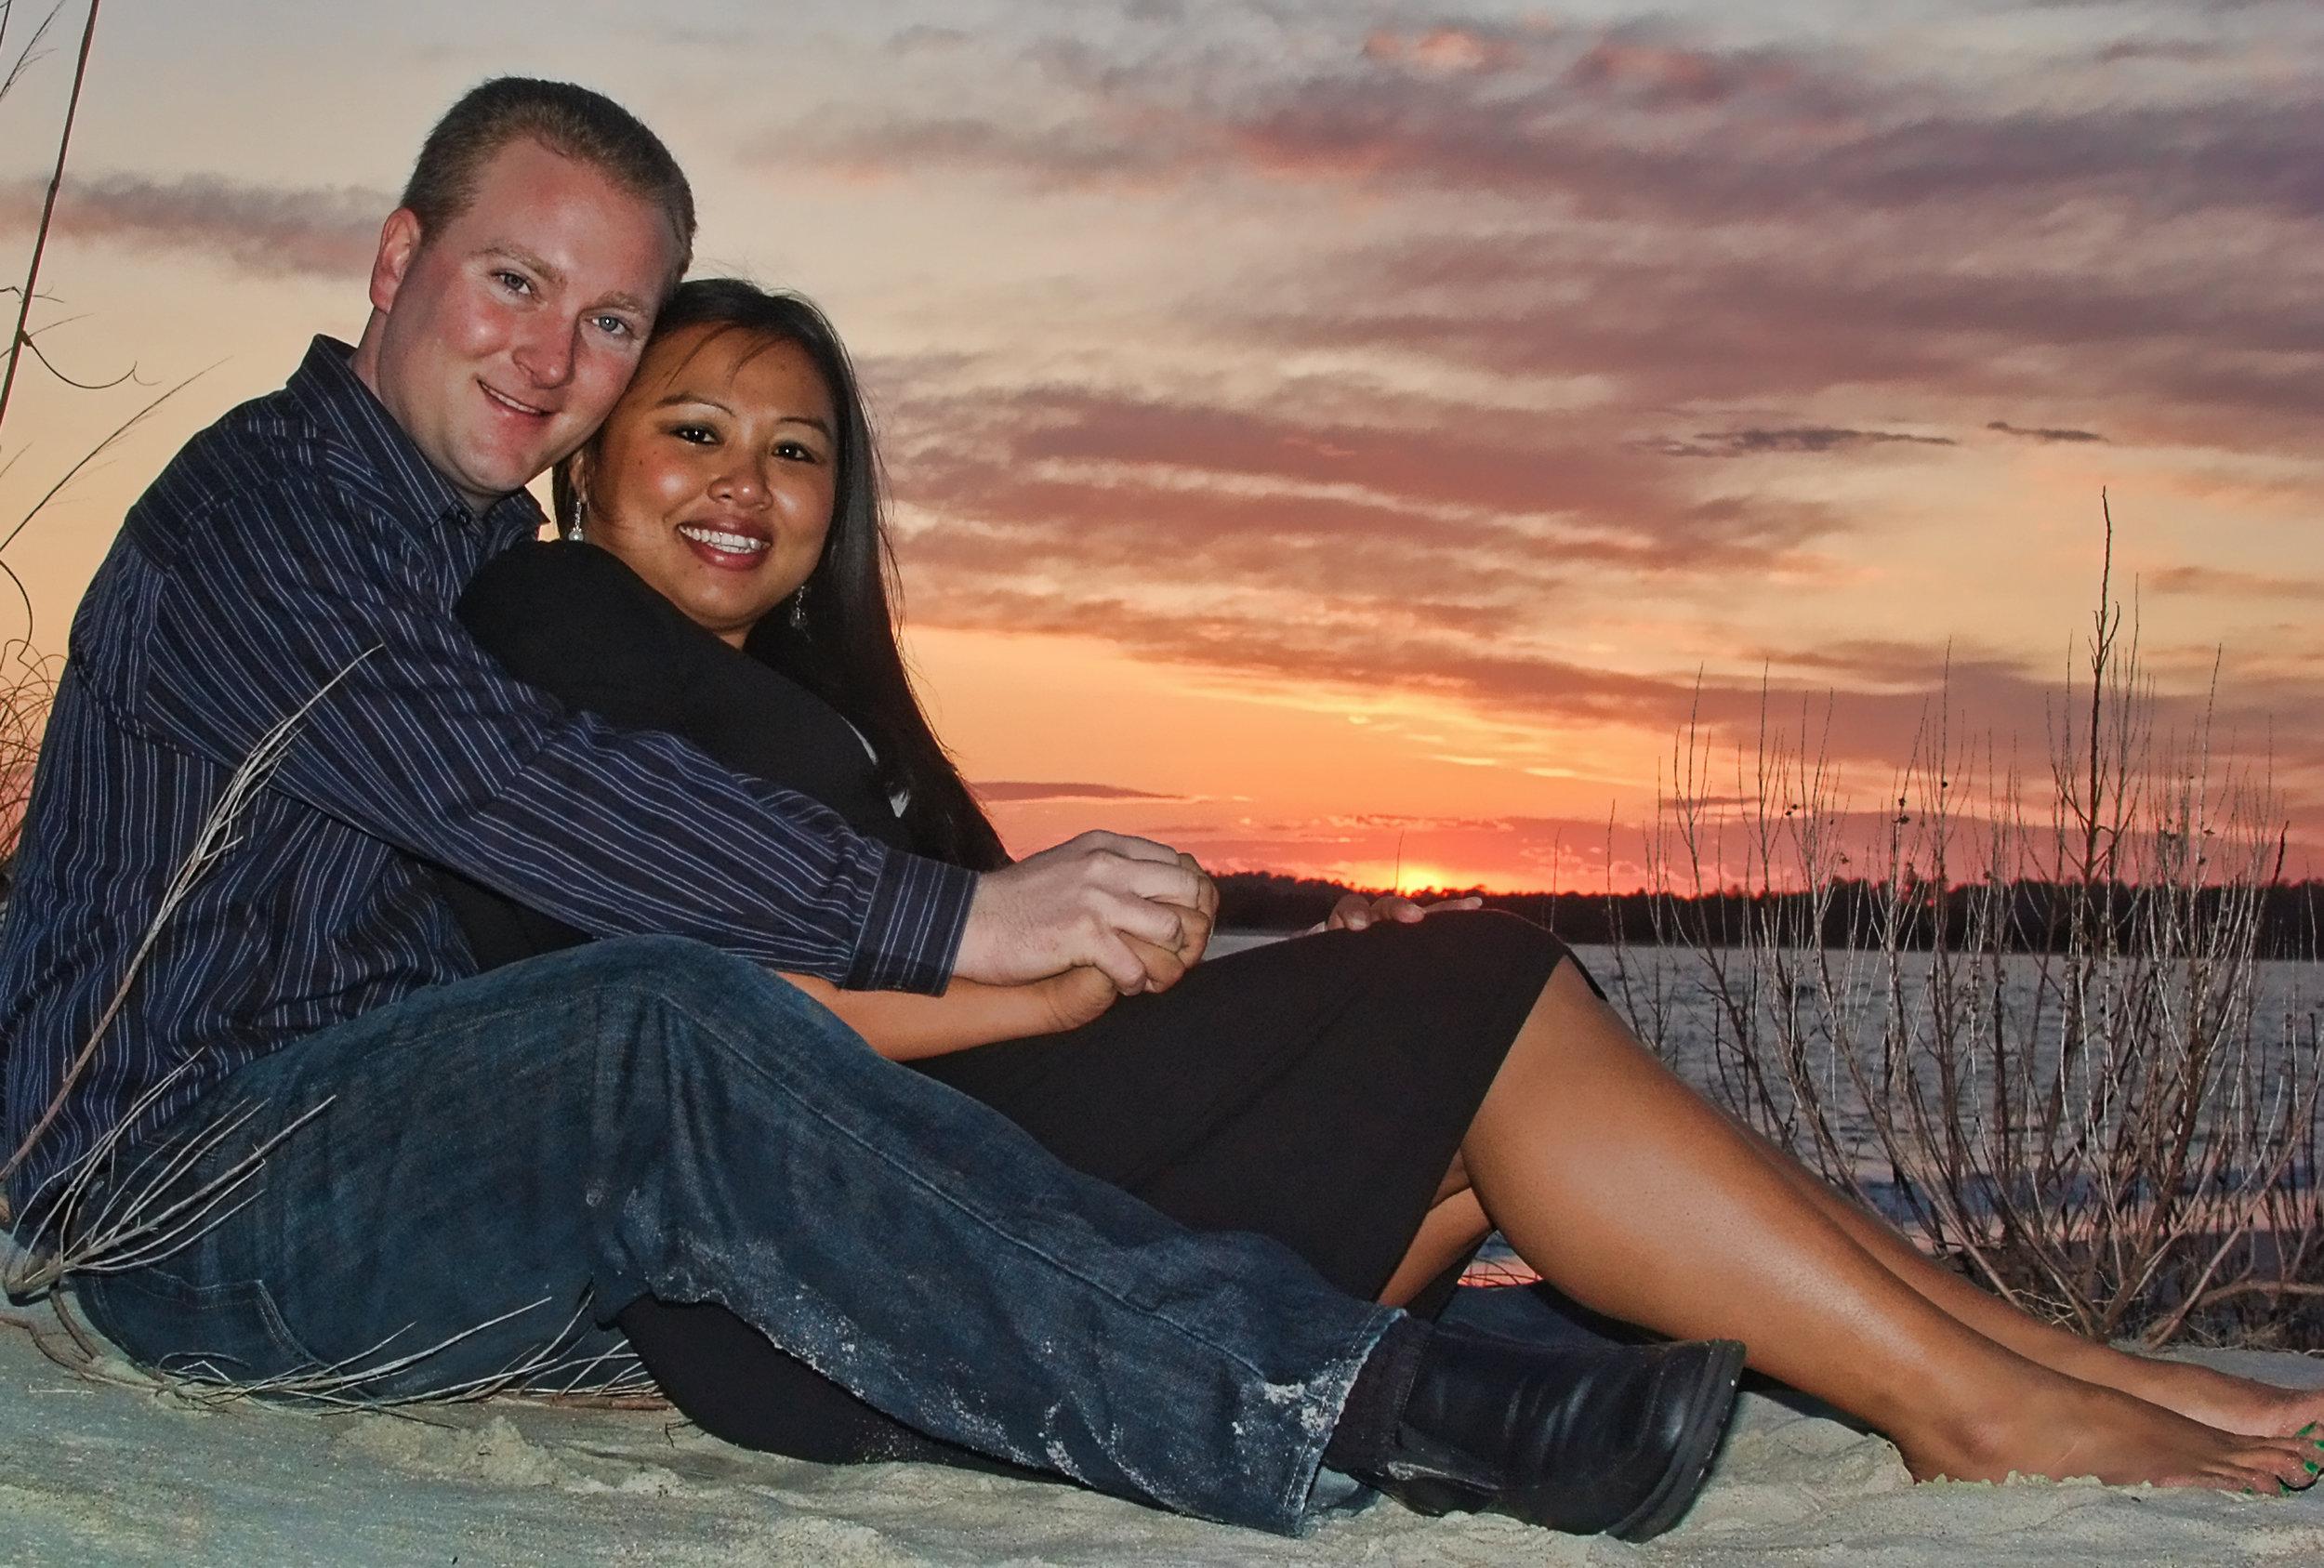 Sunset engagement photo at Wrightsville Beach, NC.